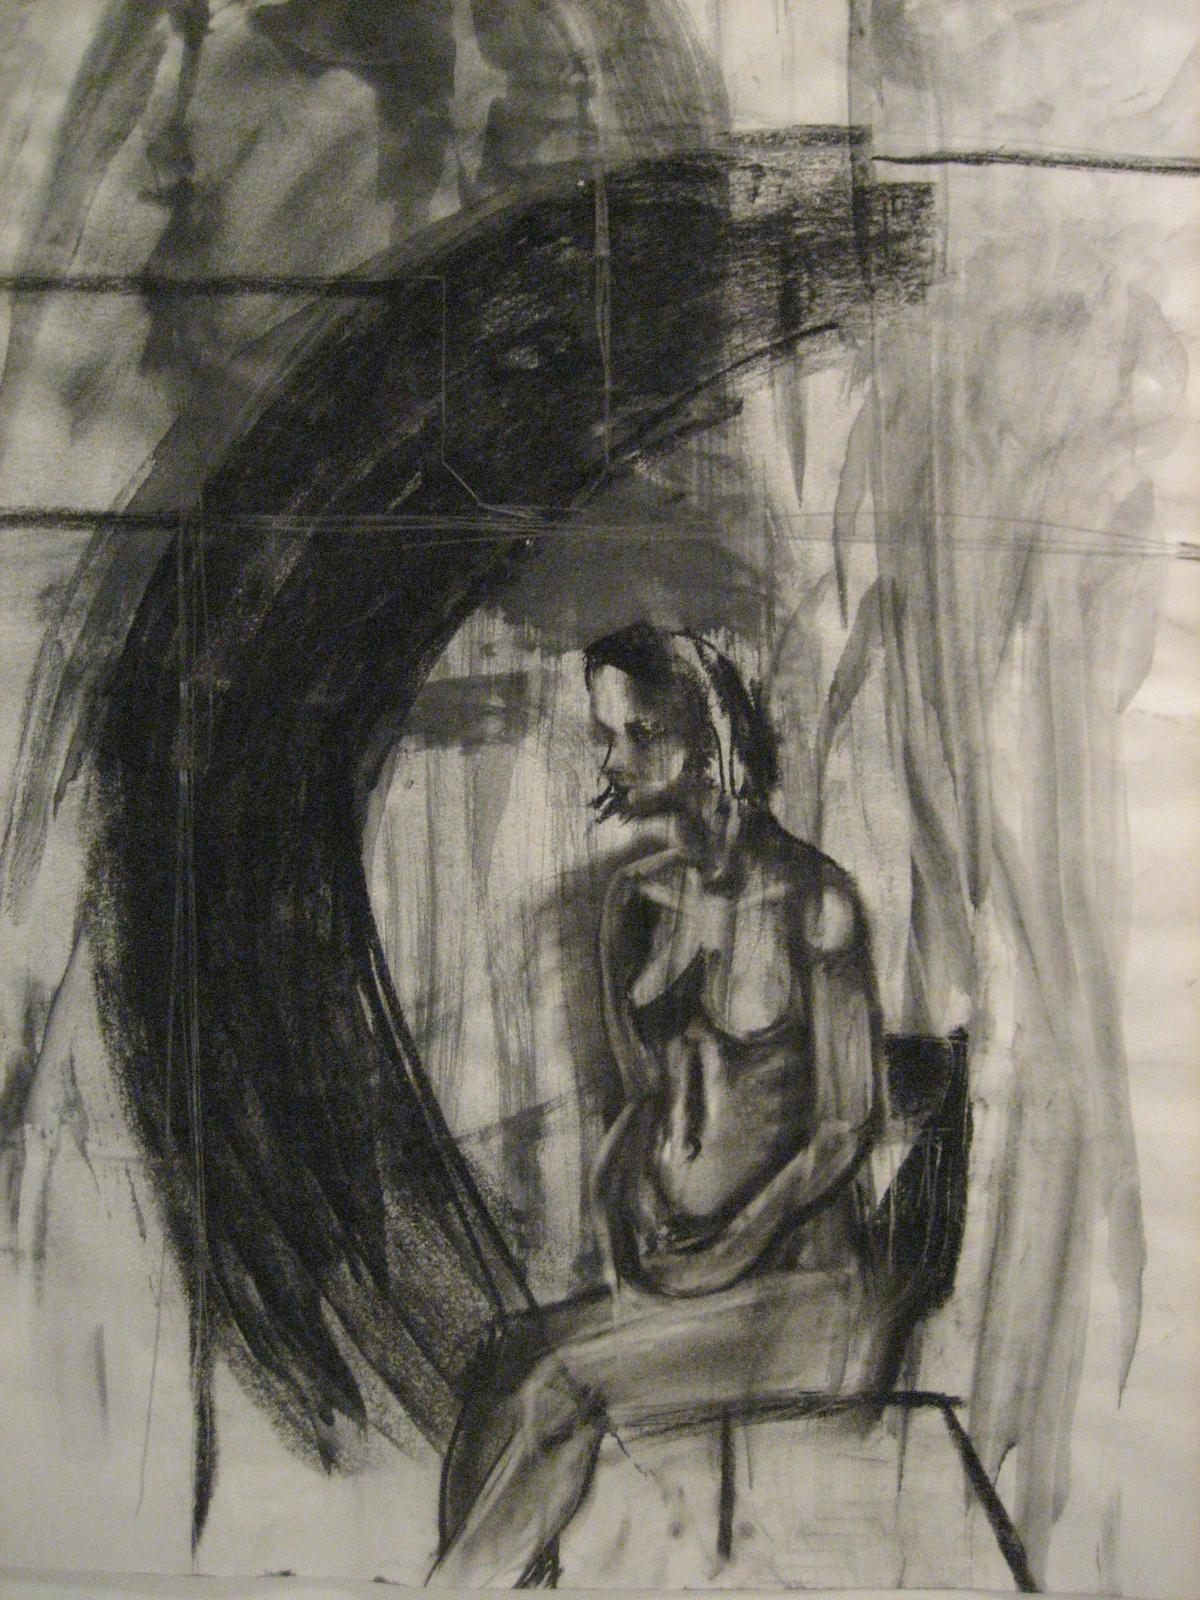 http://kristenbreyer.com/images/blog/archive/charcoalwoman.jpg